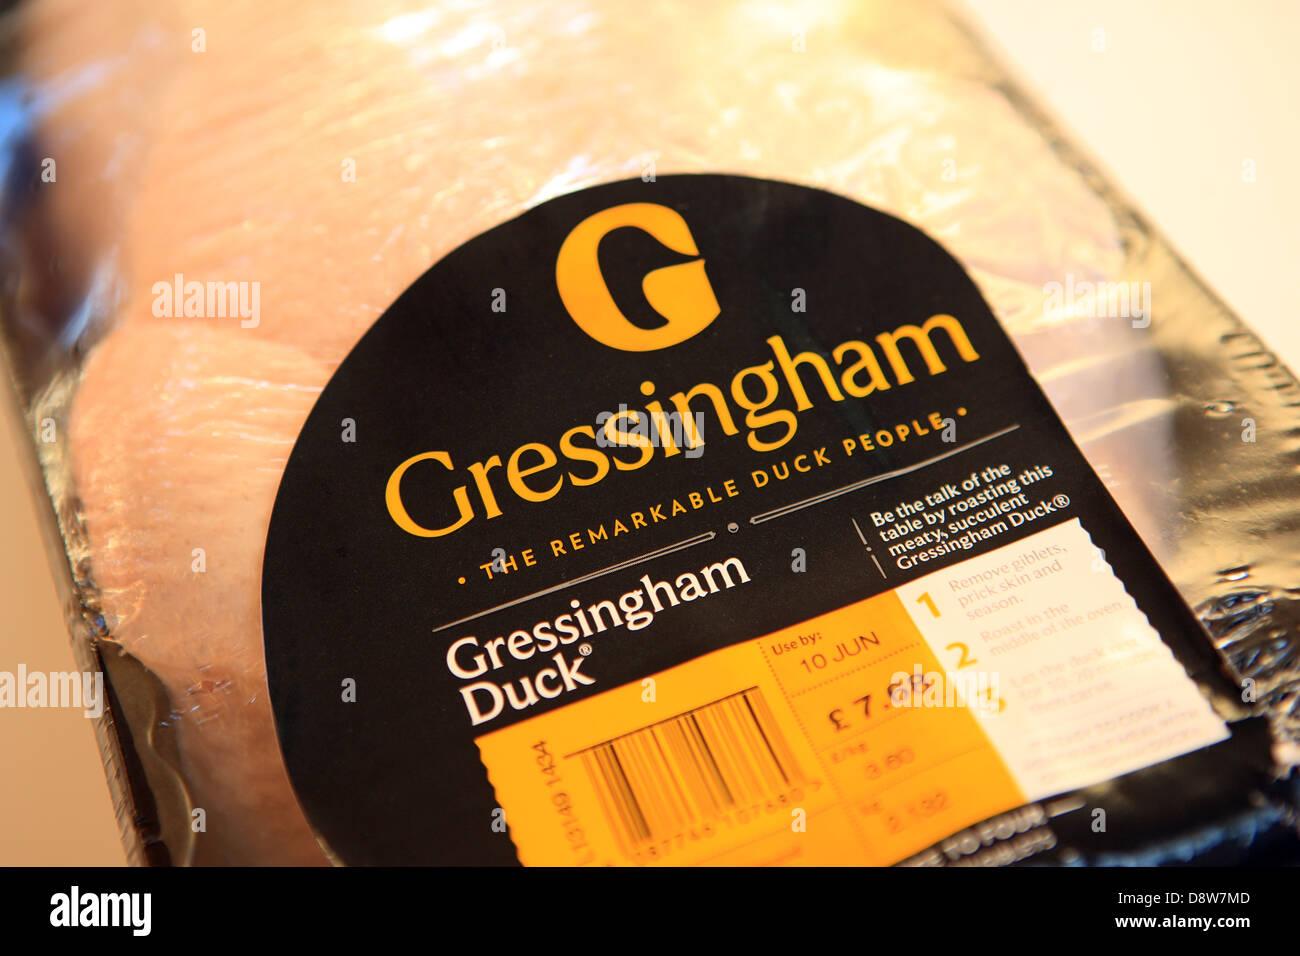 Gresshingham uncooked duck - Stock Image